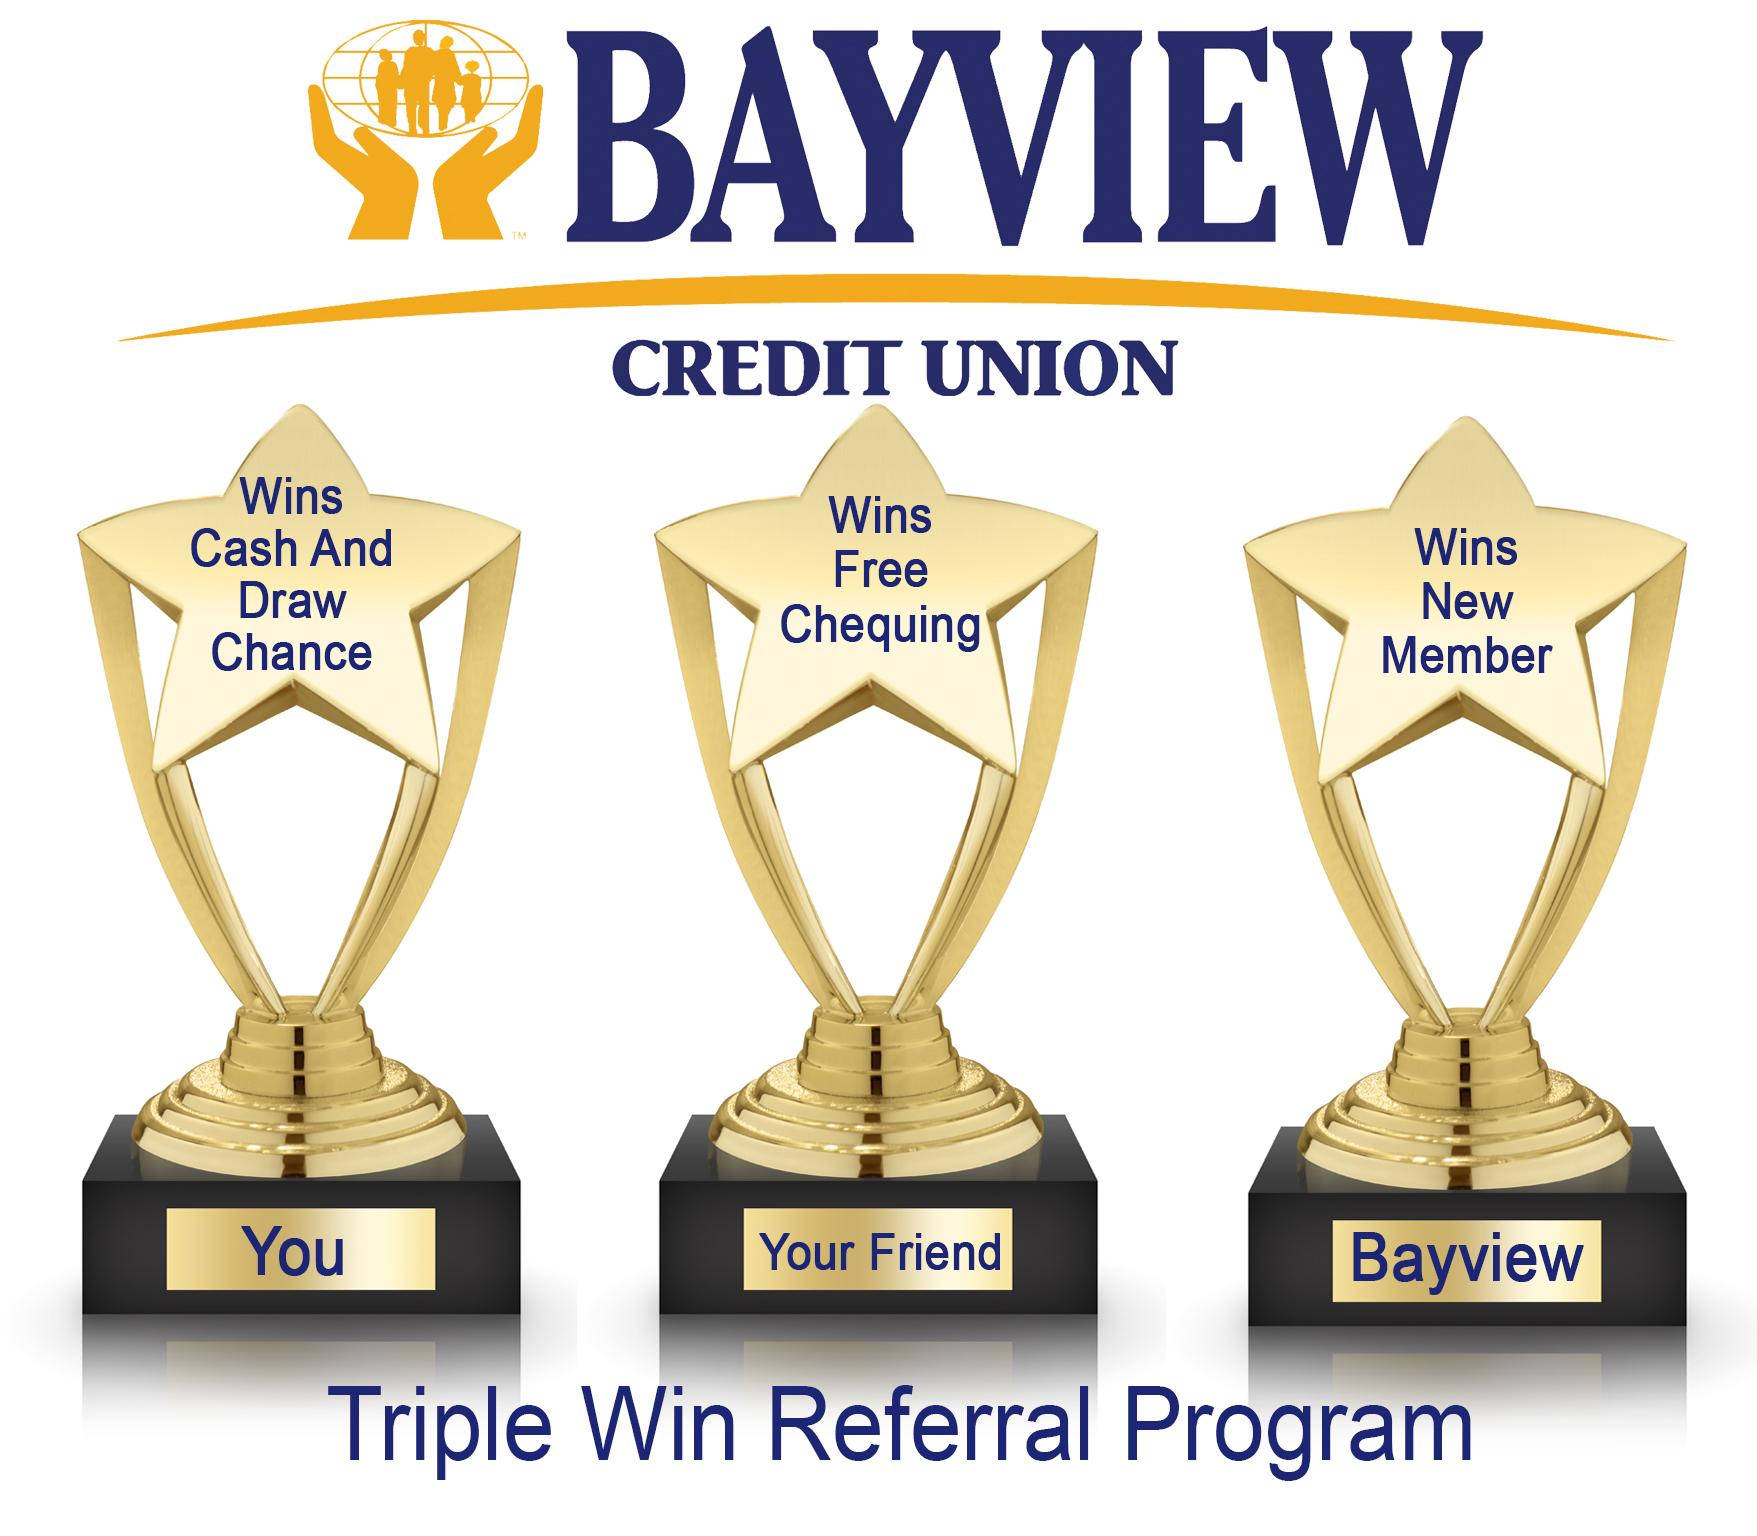 Bayview Credit Union - Triple Win Referral Program